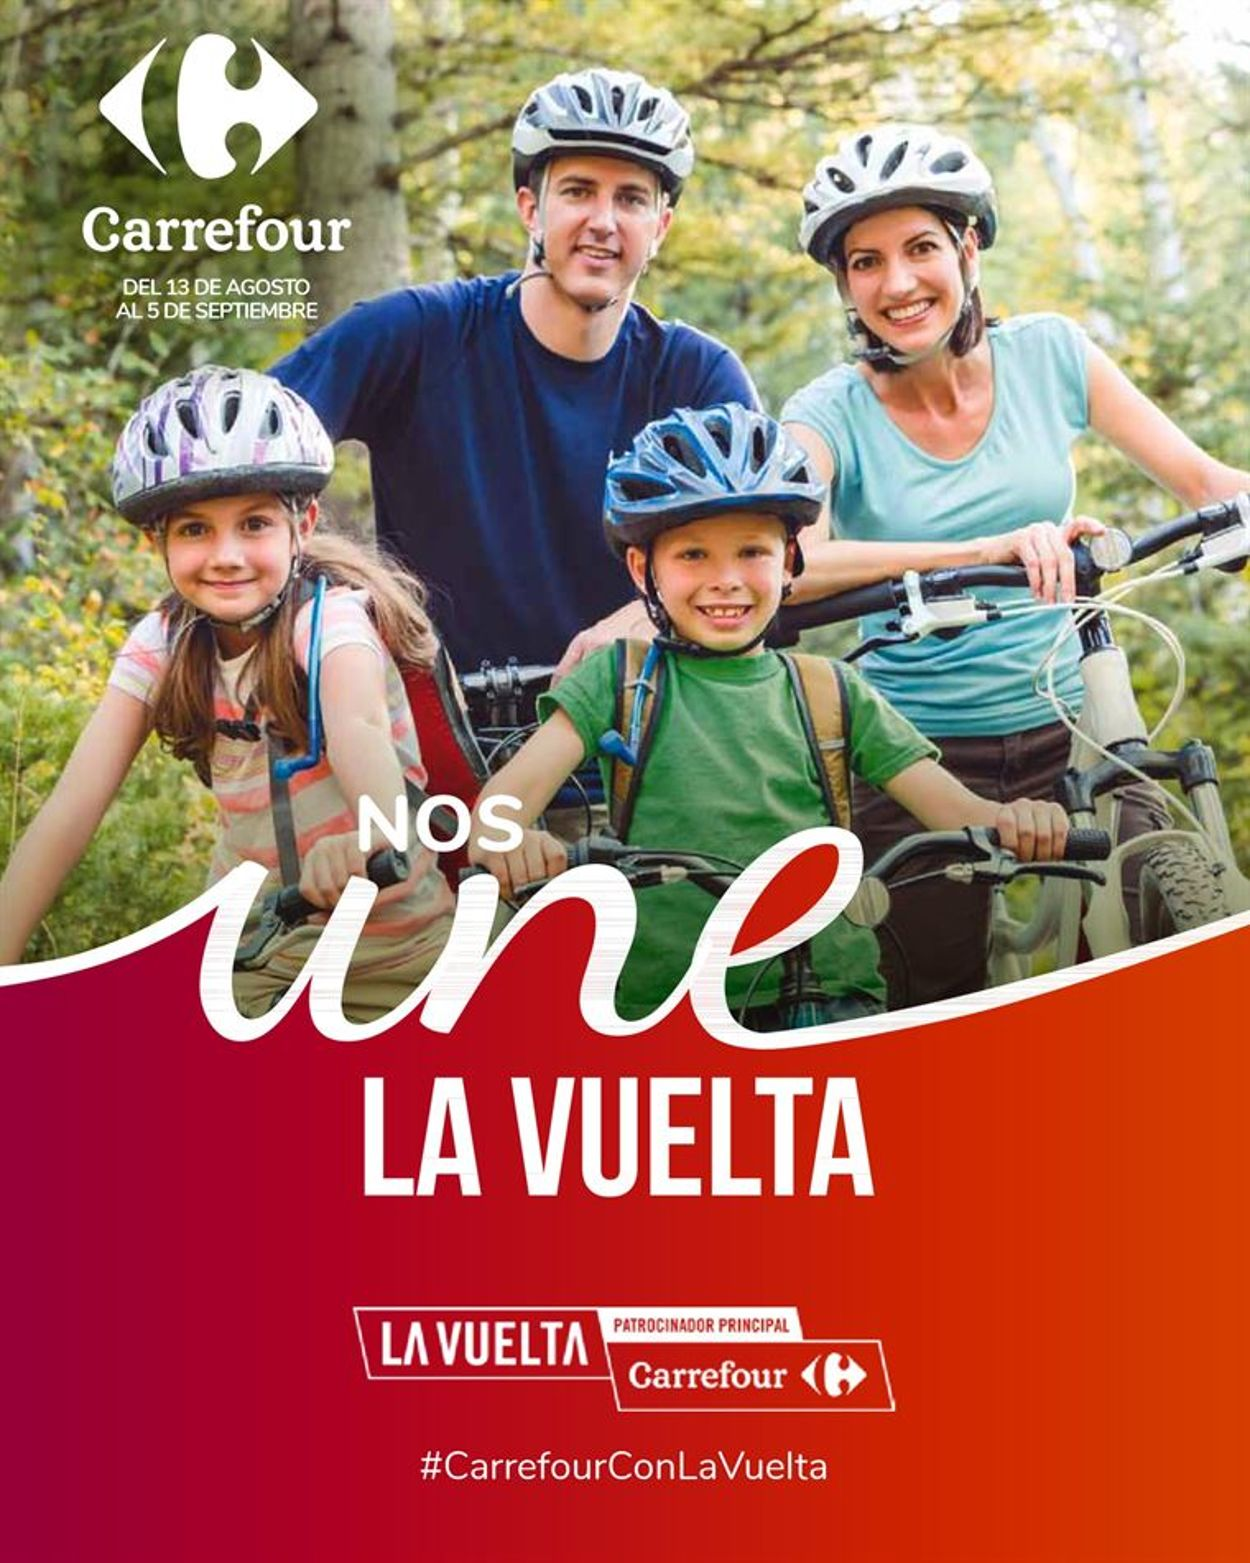 Carrefour Folleto - 13.08-05.09.2021